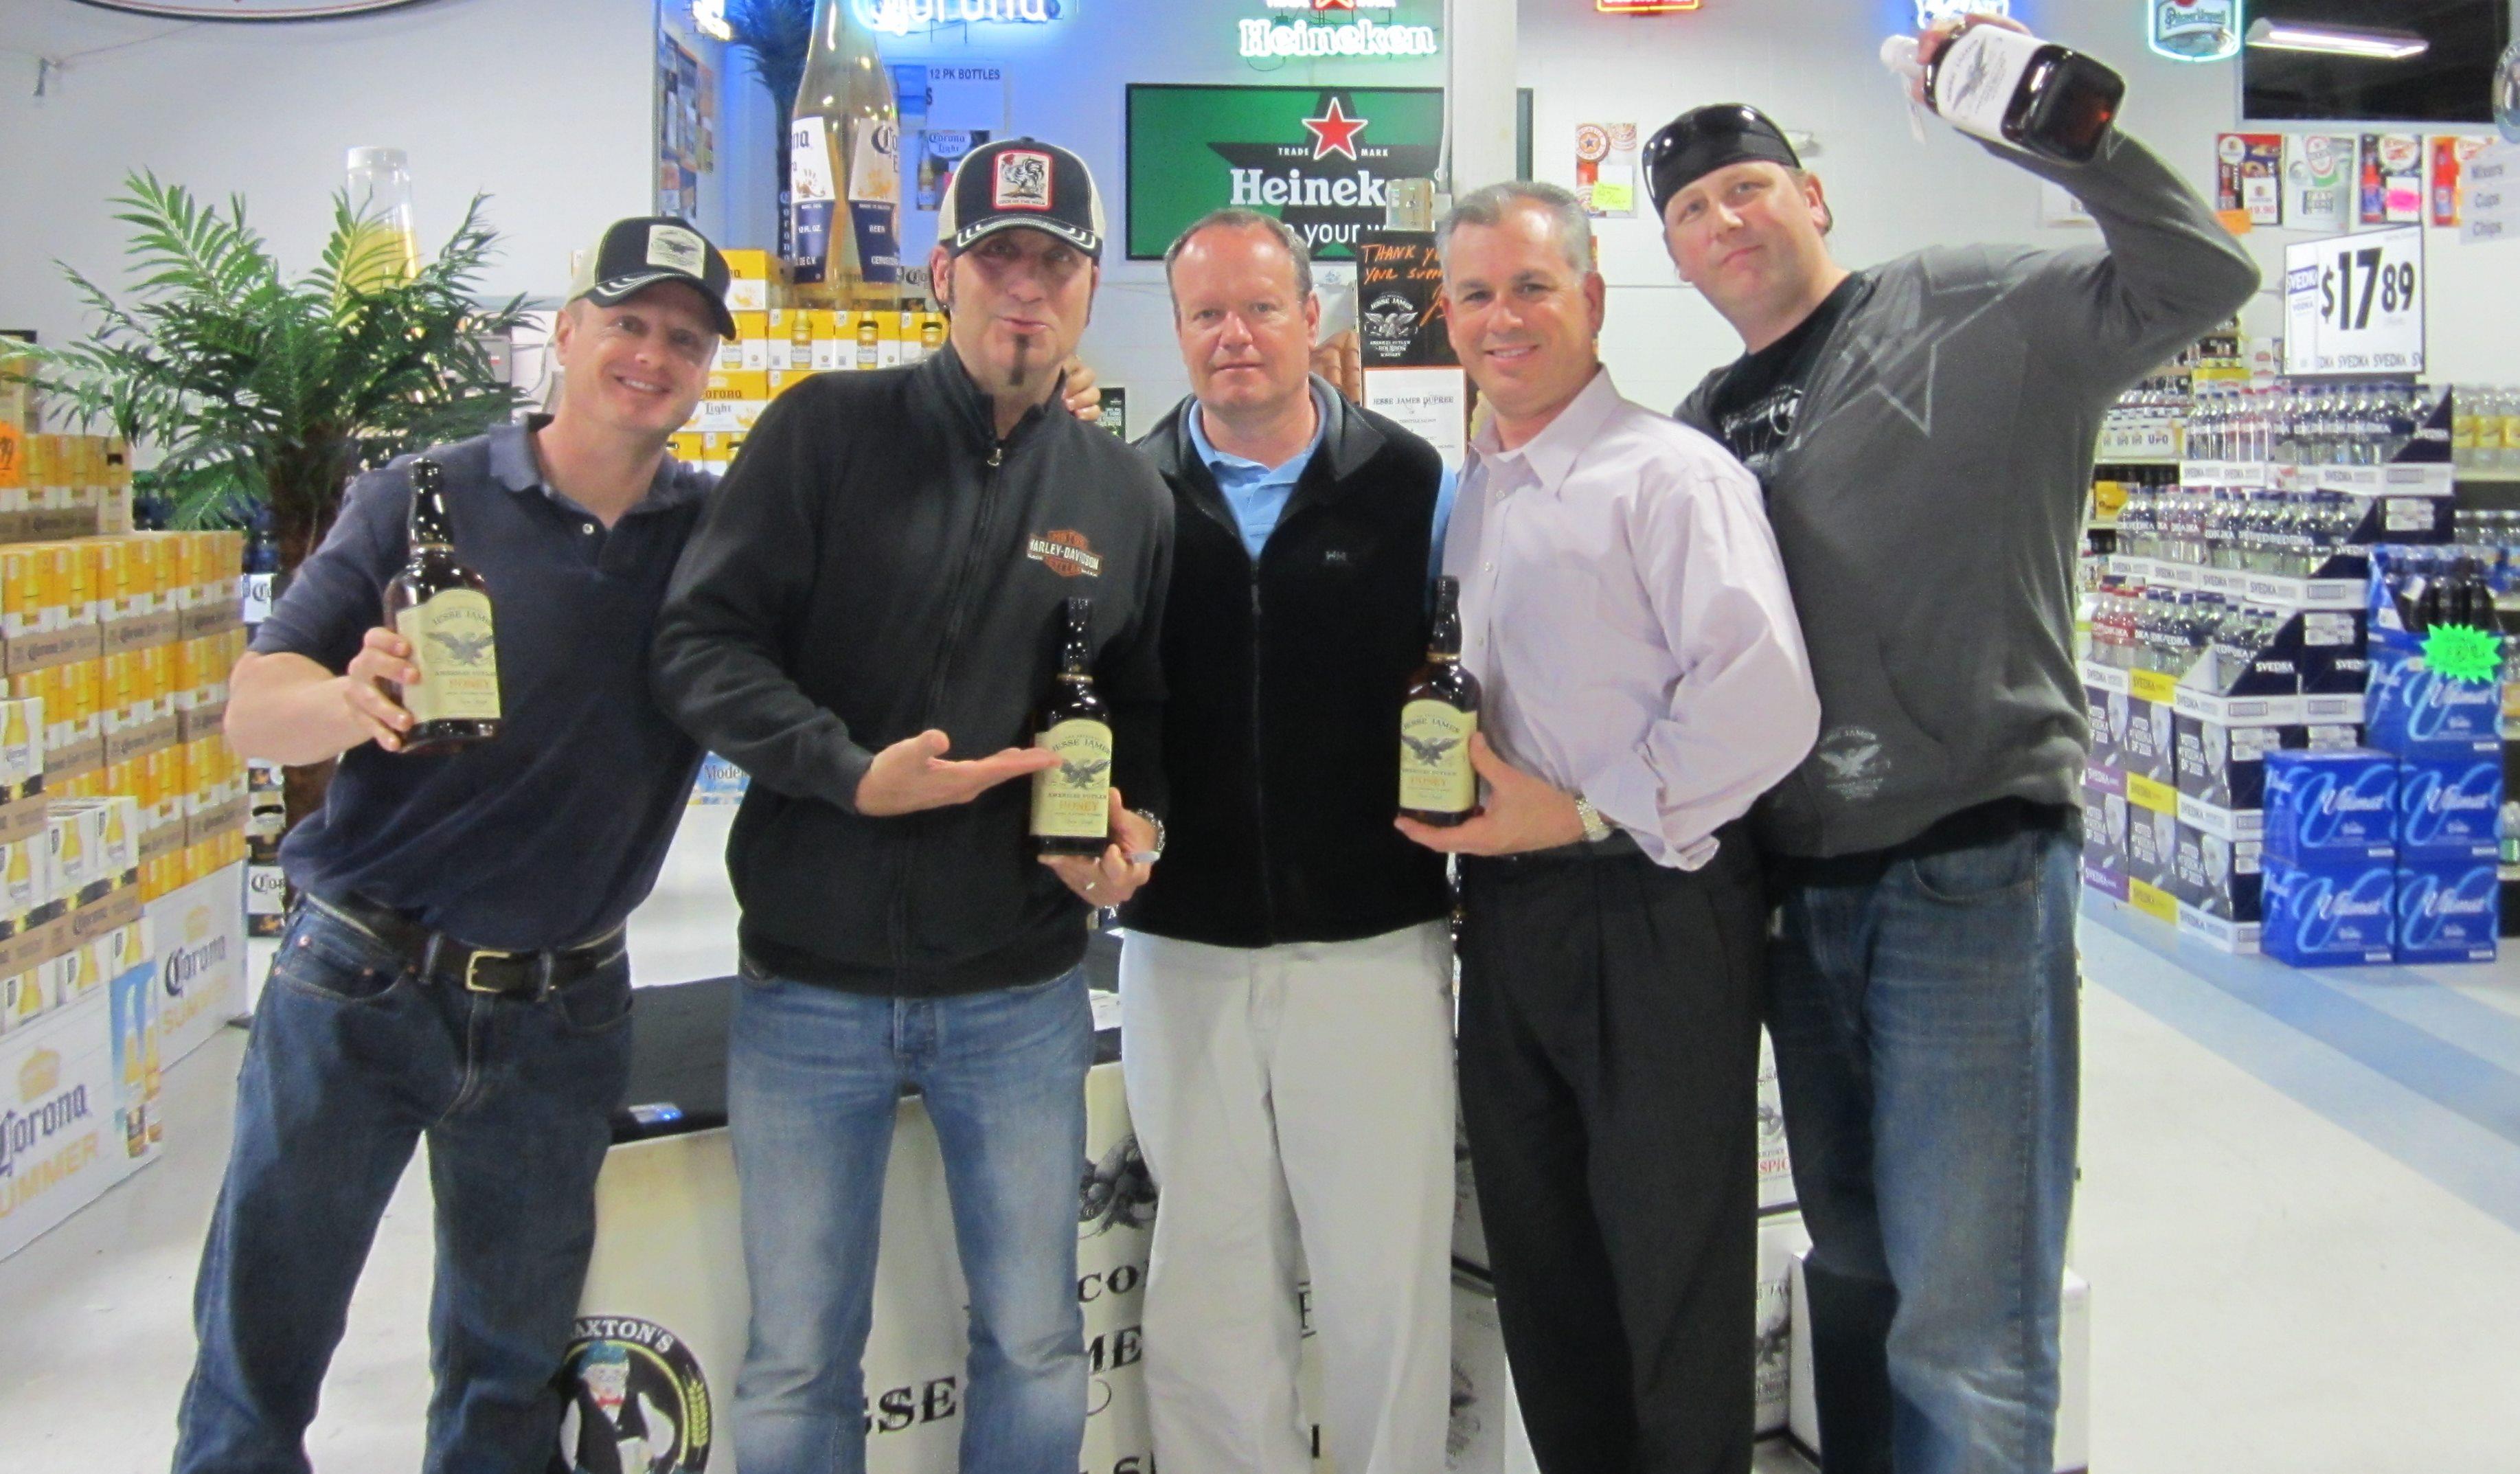 Jackyl's Jesse James Dupree Visits RI with Namesake Bourbon